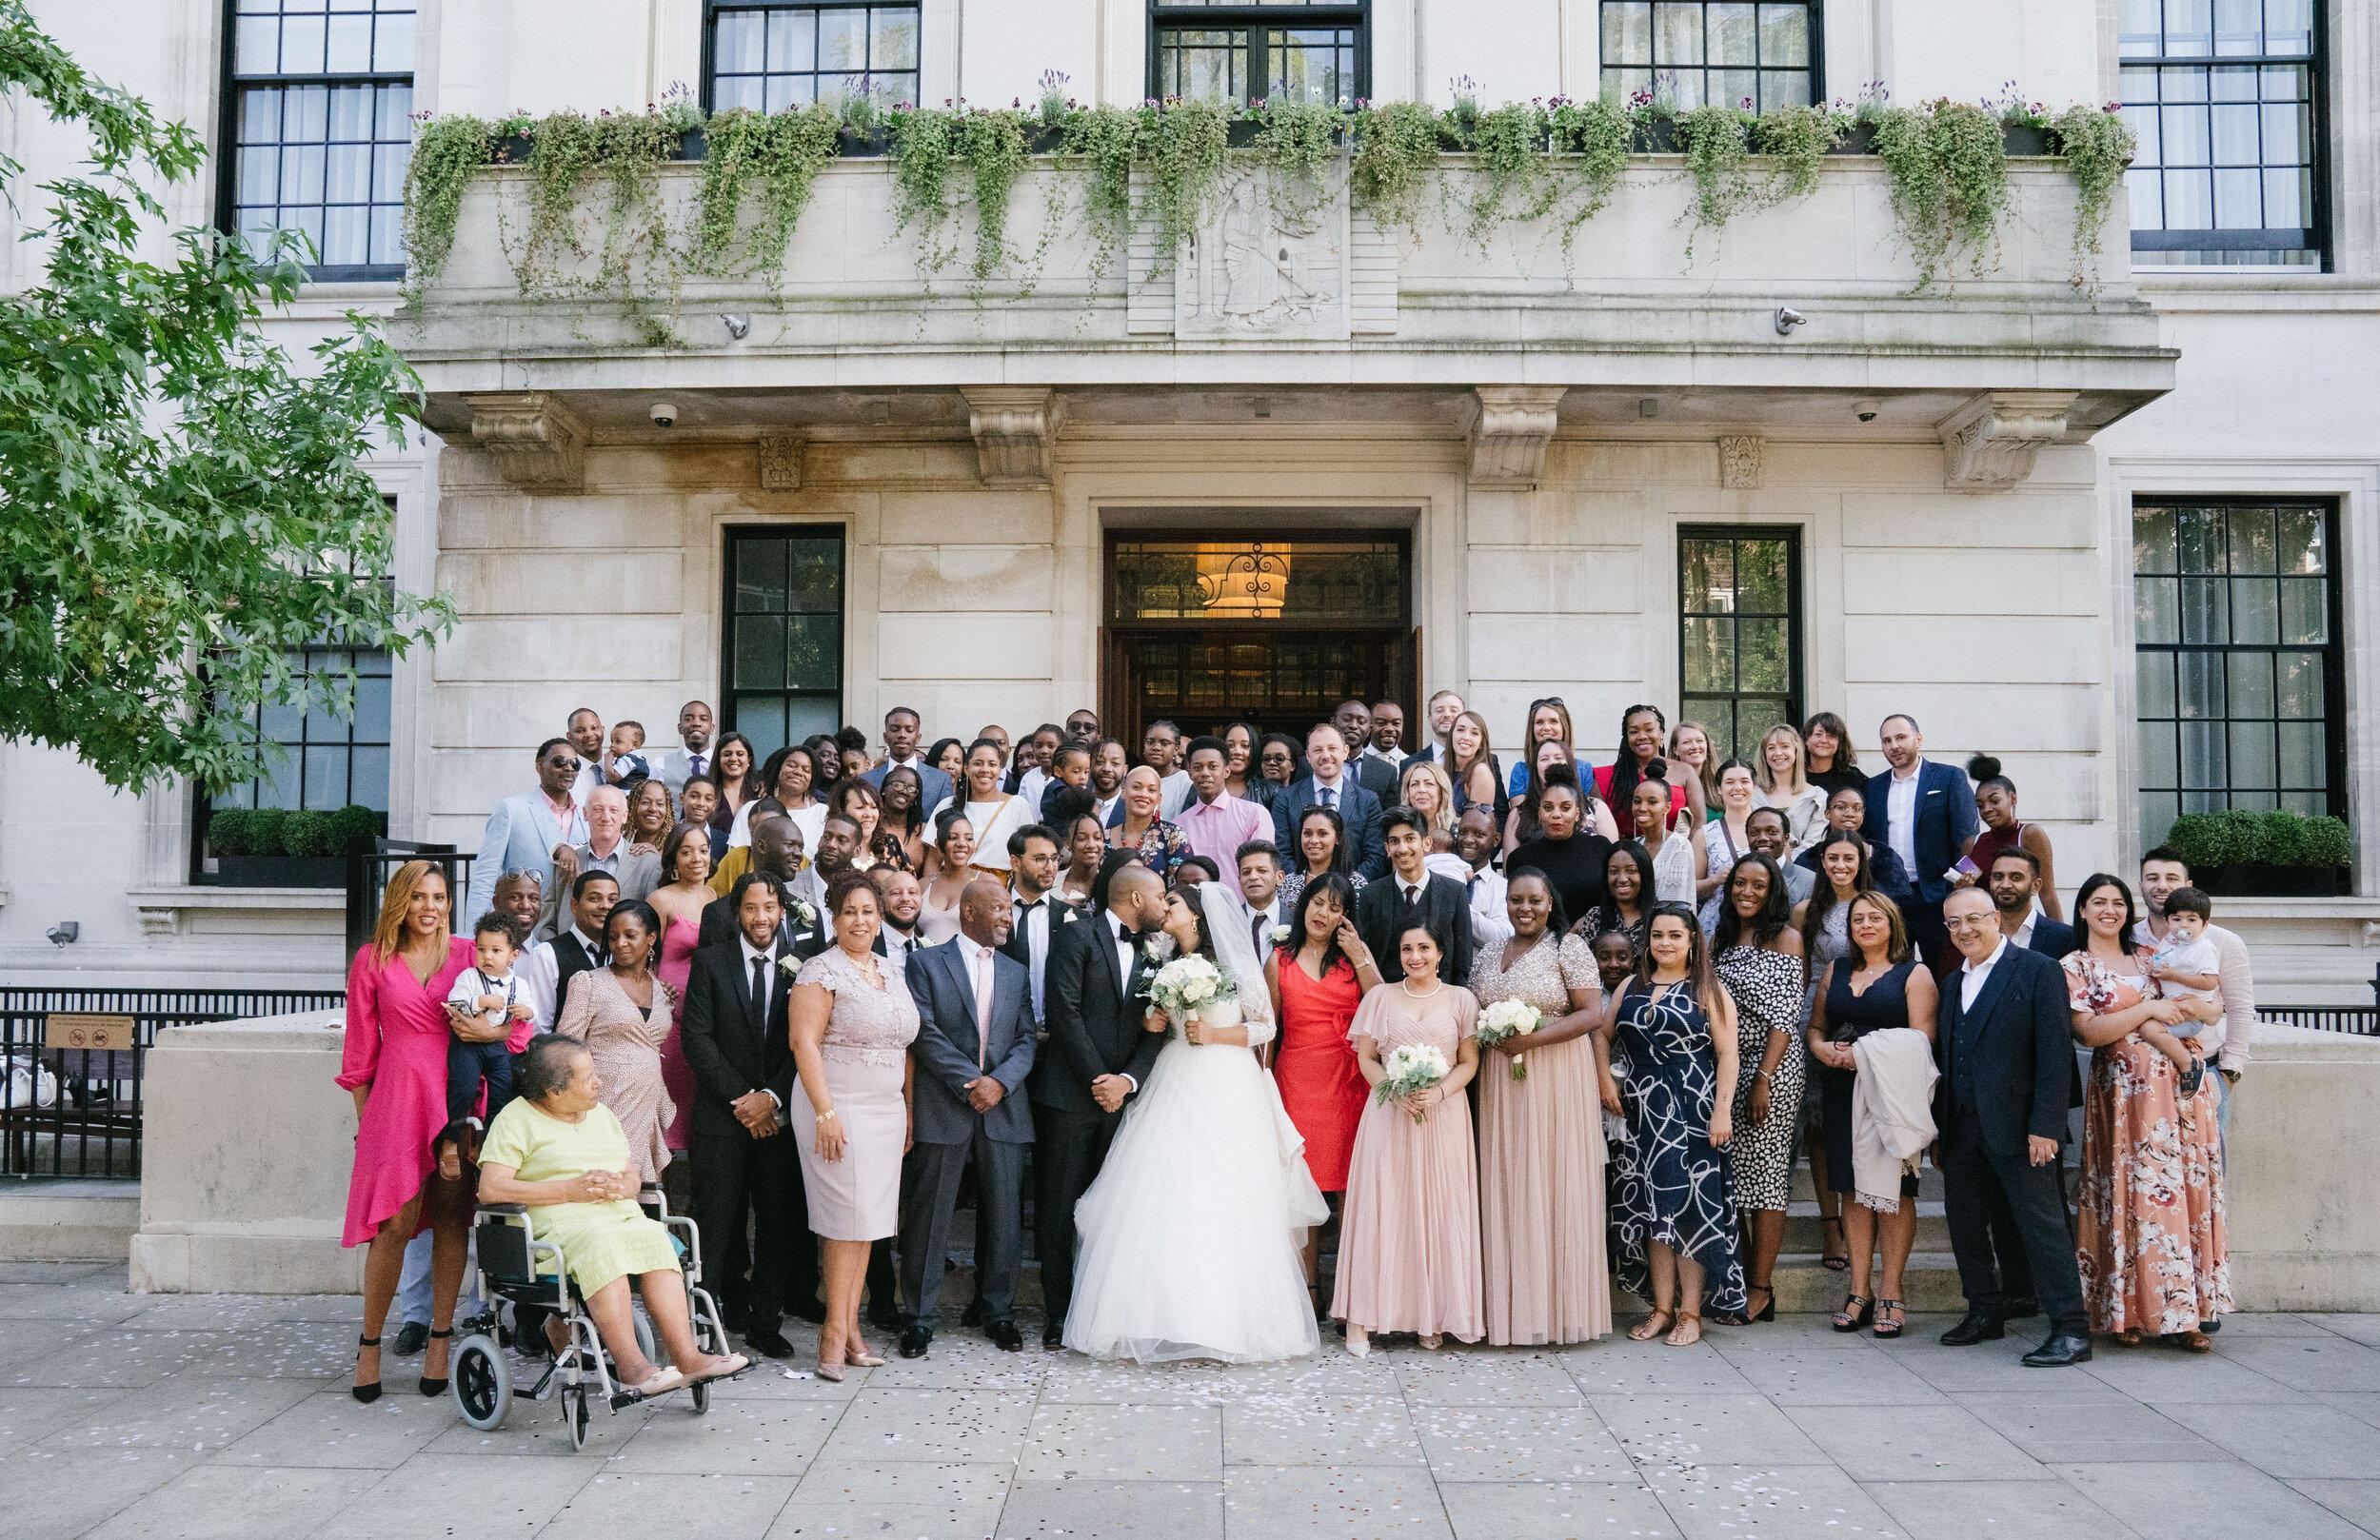 east-london-wedding-photographer-videographer-patriot-square-apartments-59